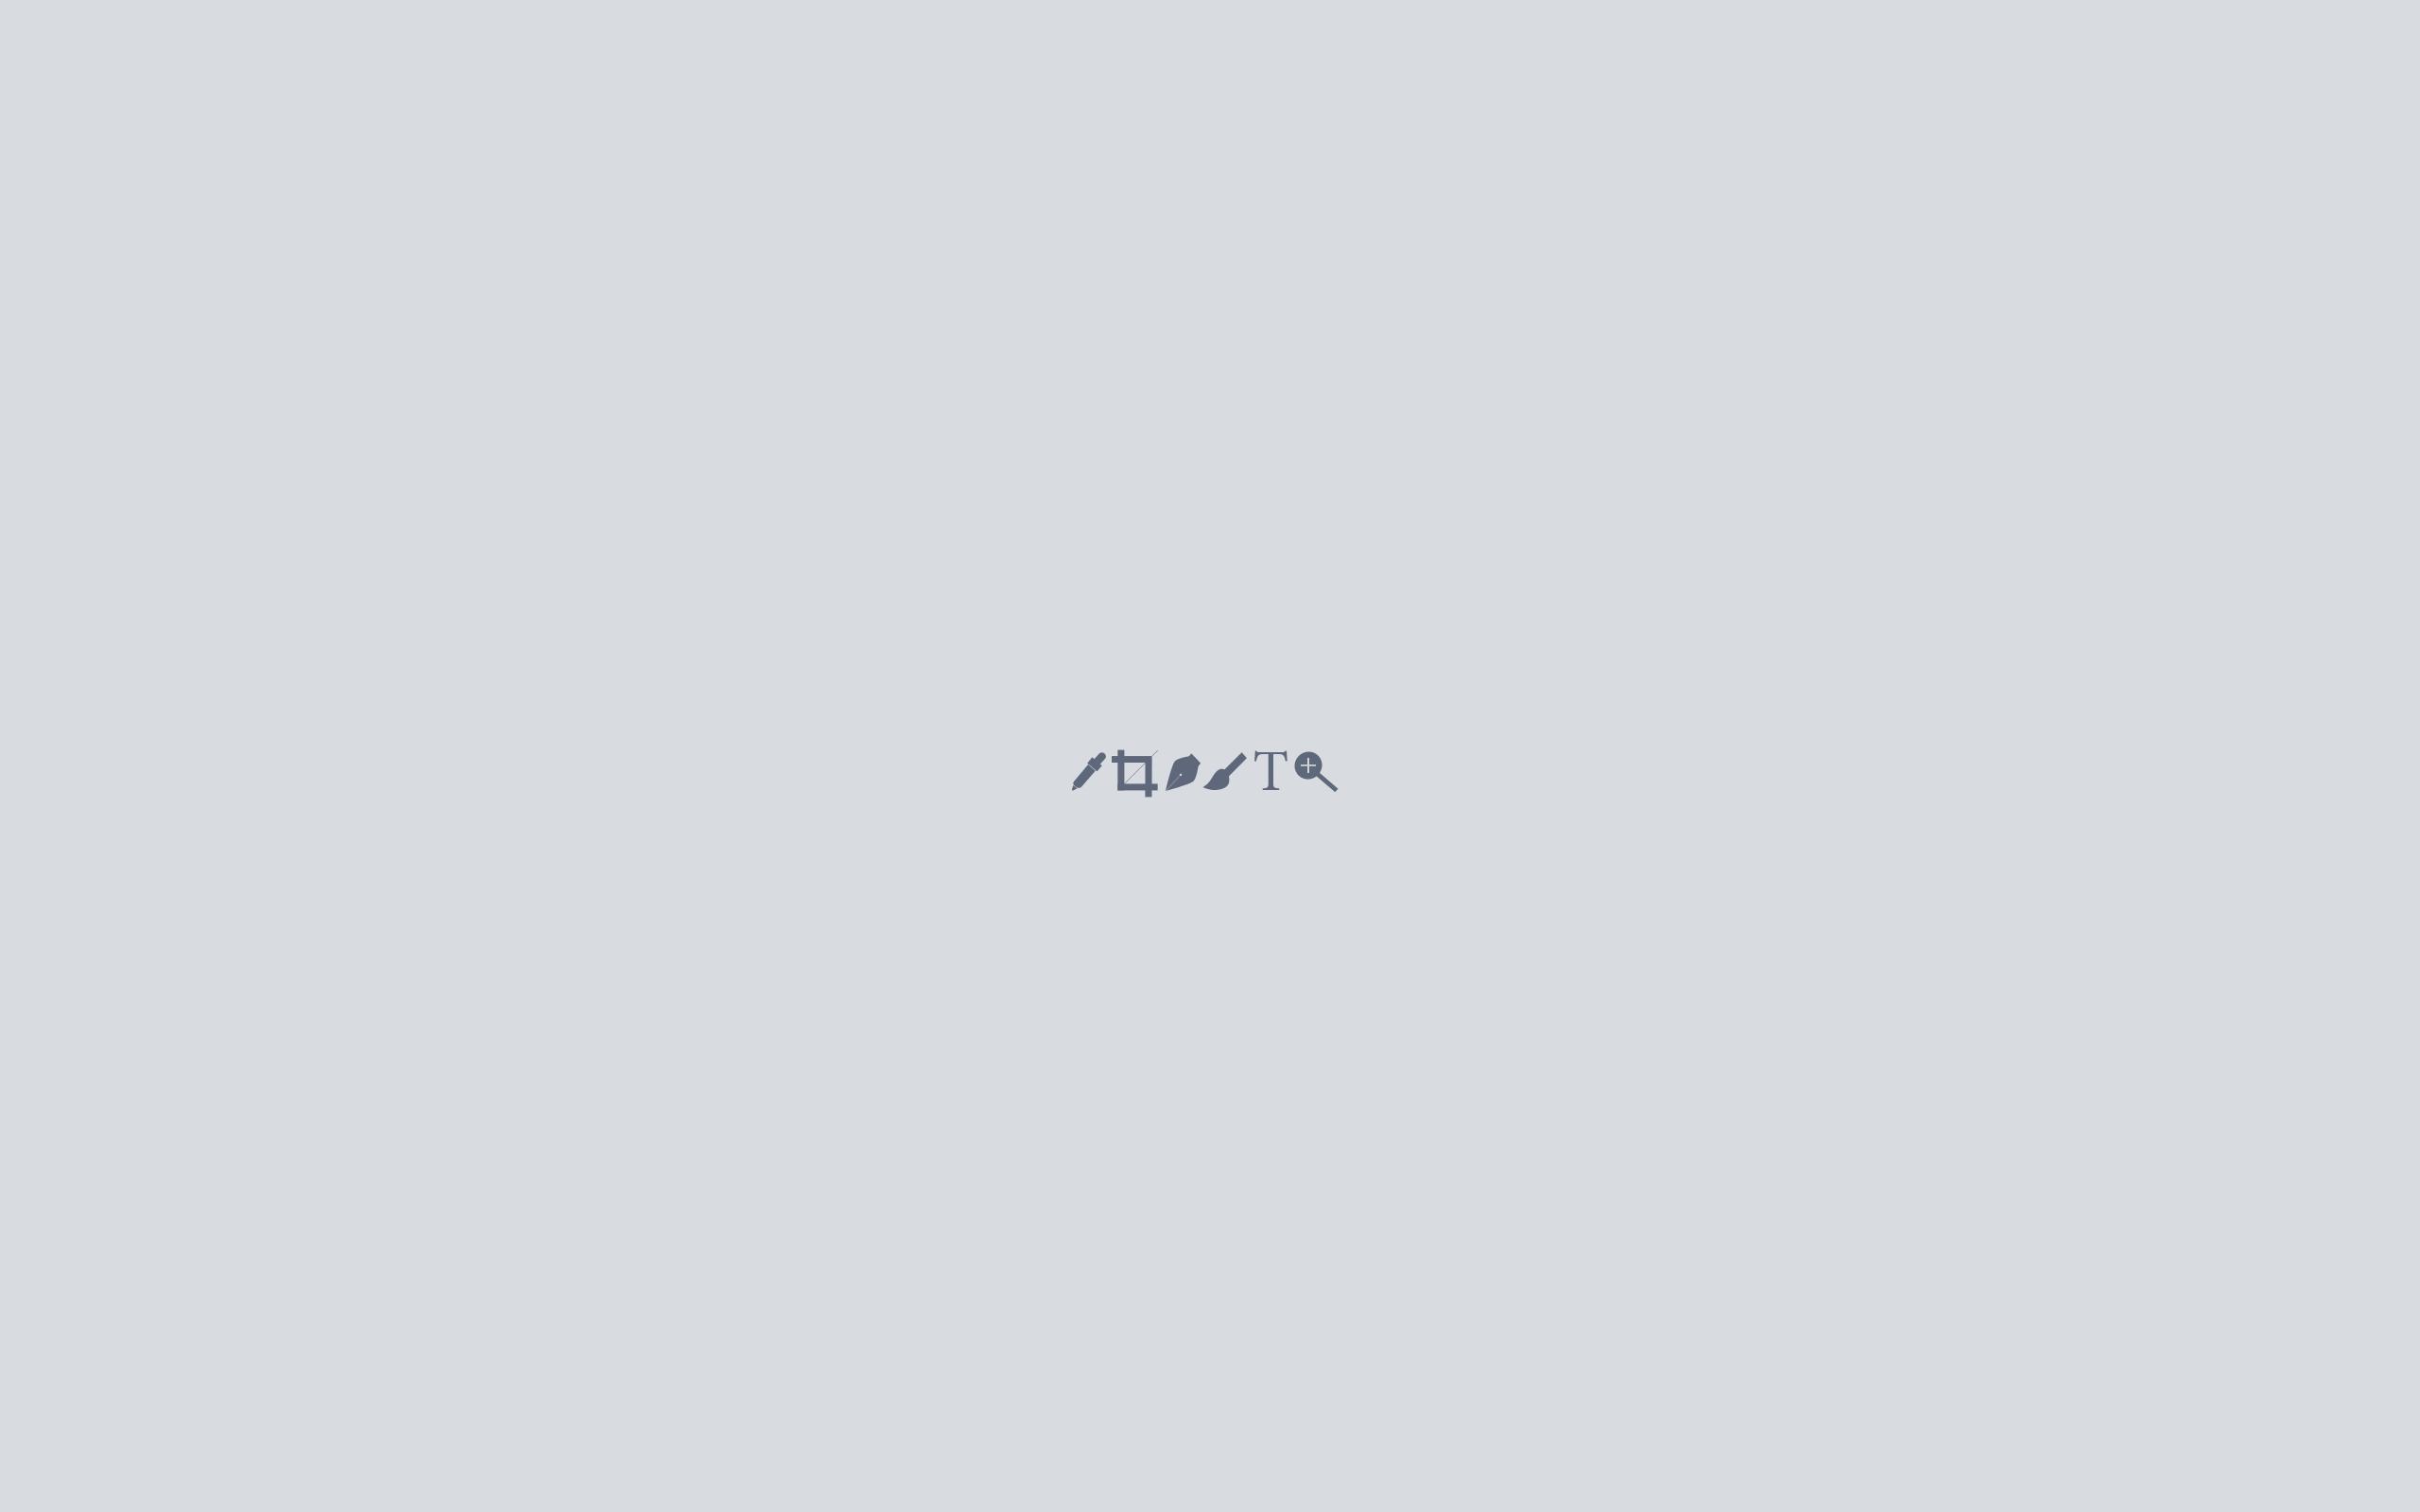 Japanese Aesthetic Sayings Wallpapers - Top Free Japanese ...